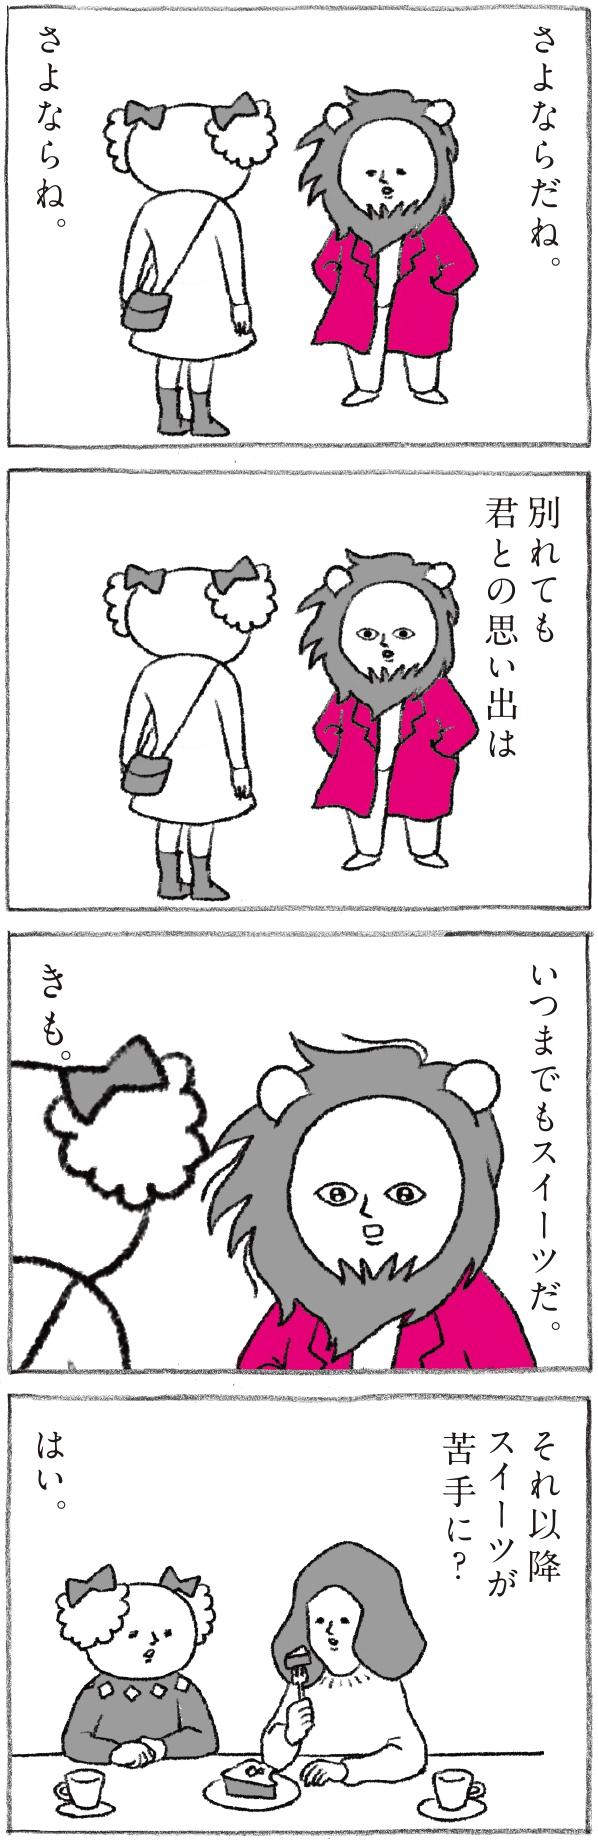 Hanako 1192号:おかわり自由